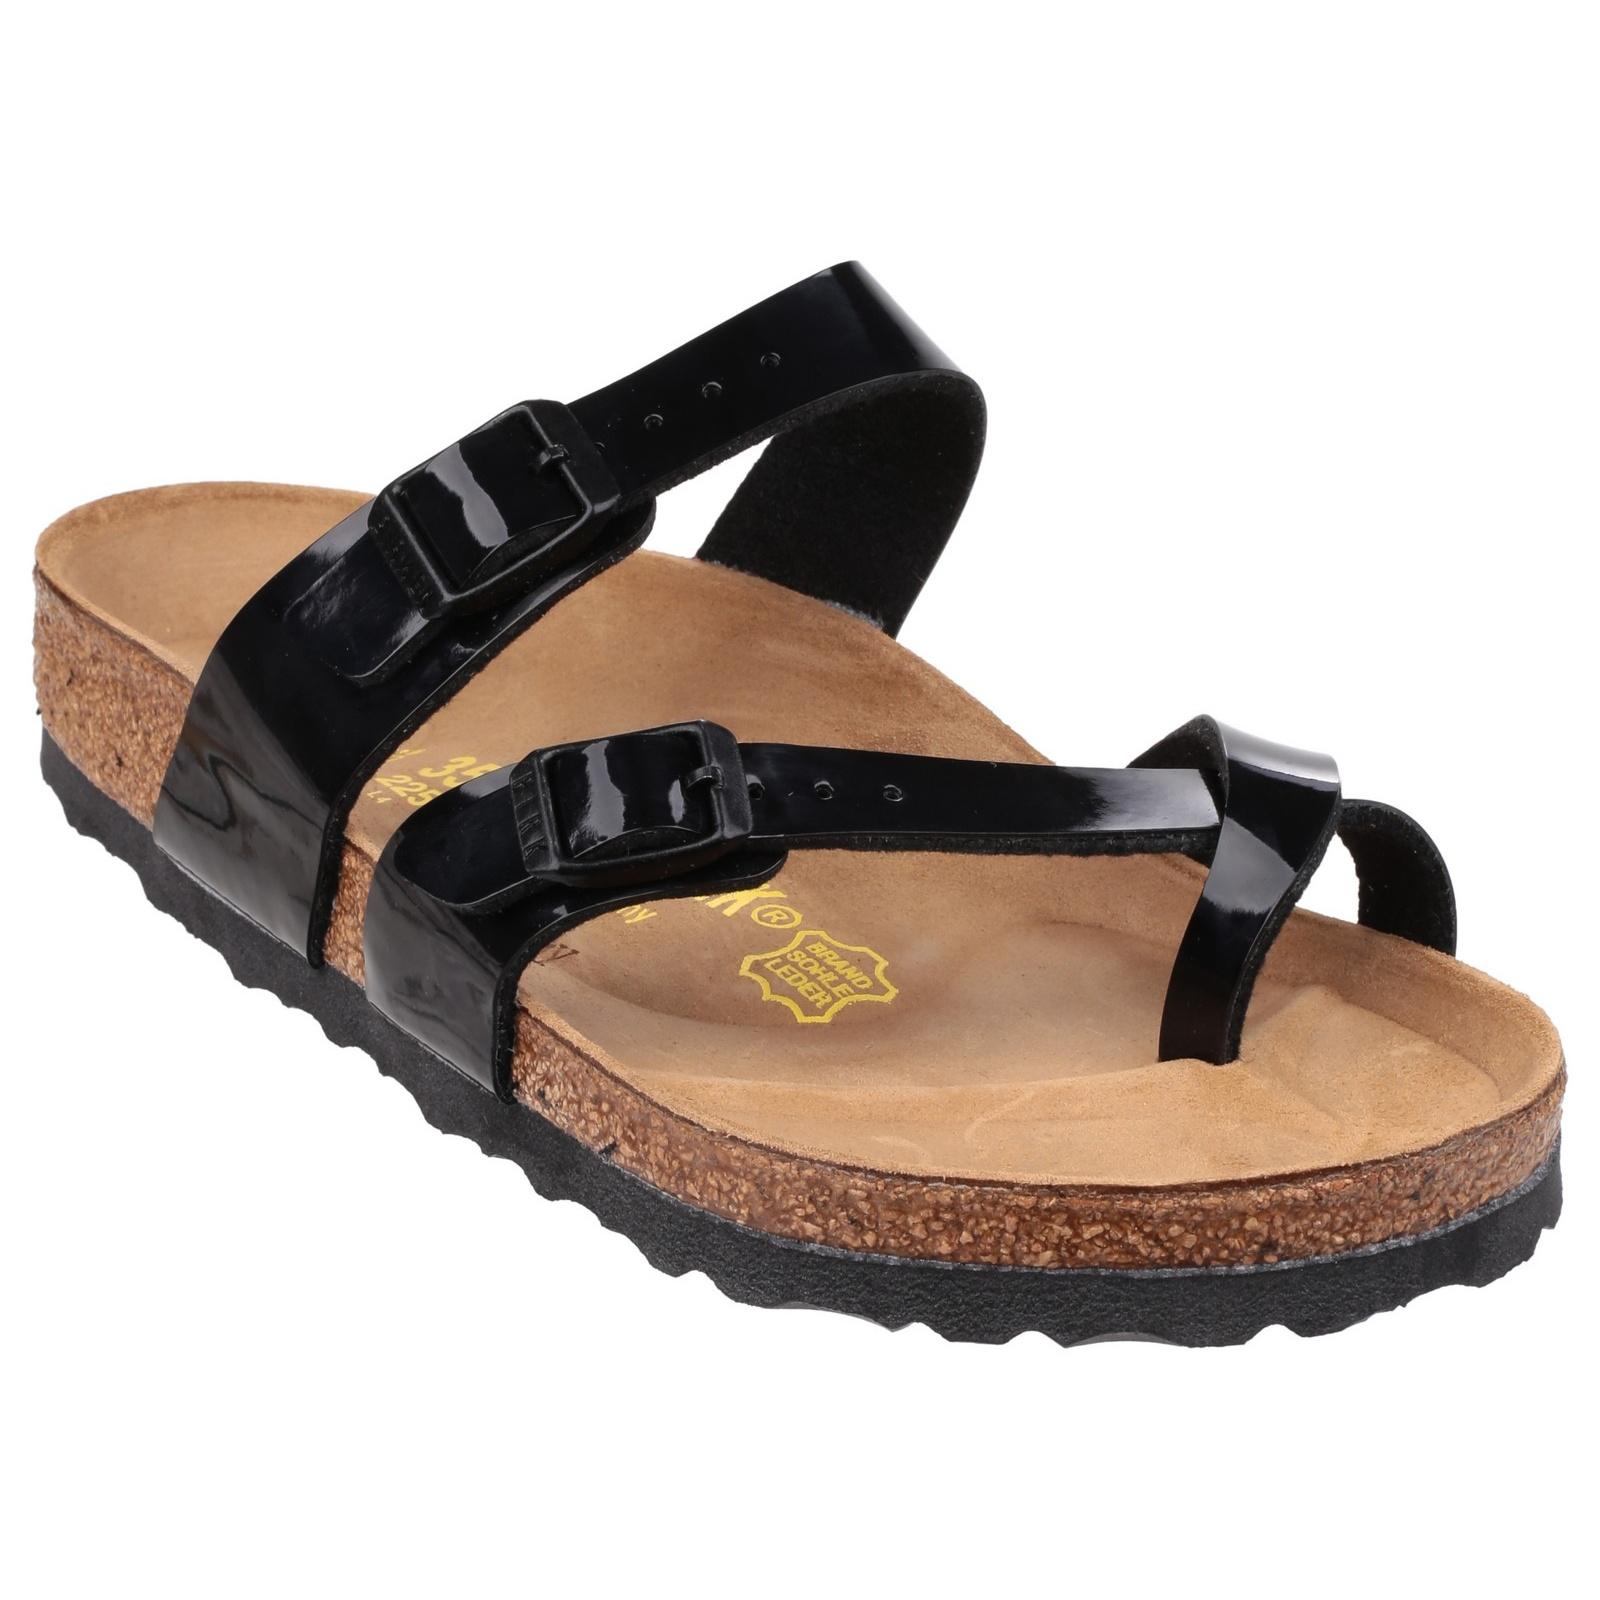 Birkenstock Womens/Ladies Mayari Toe Loop Summer Sandals ...